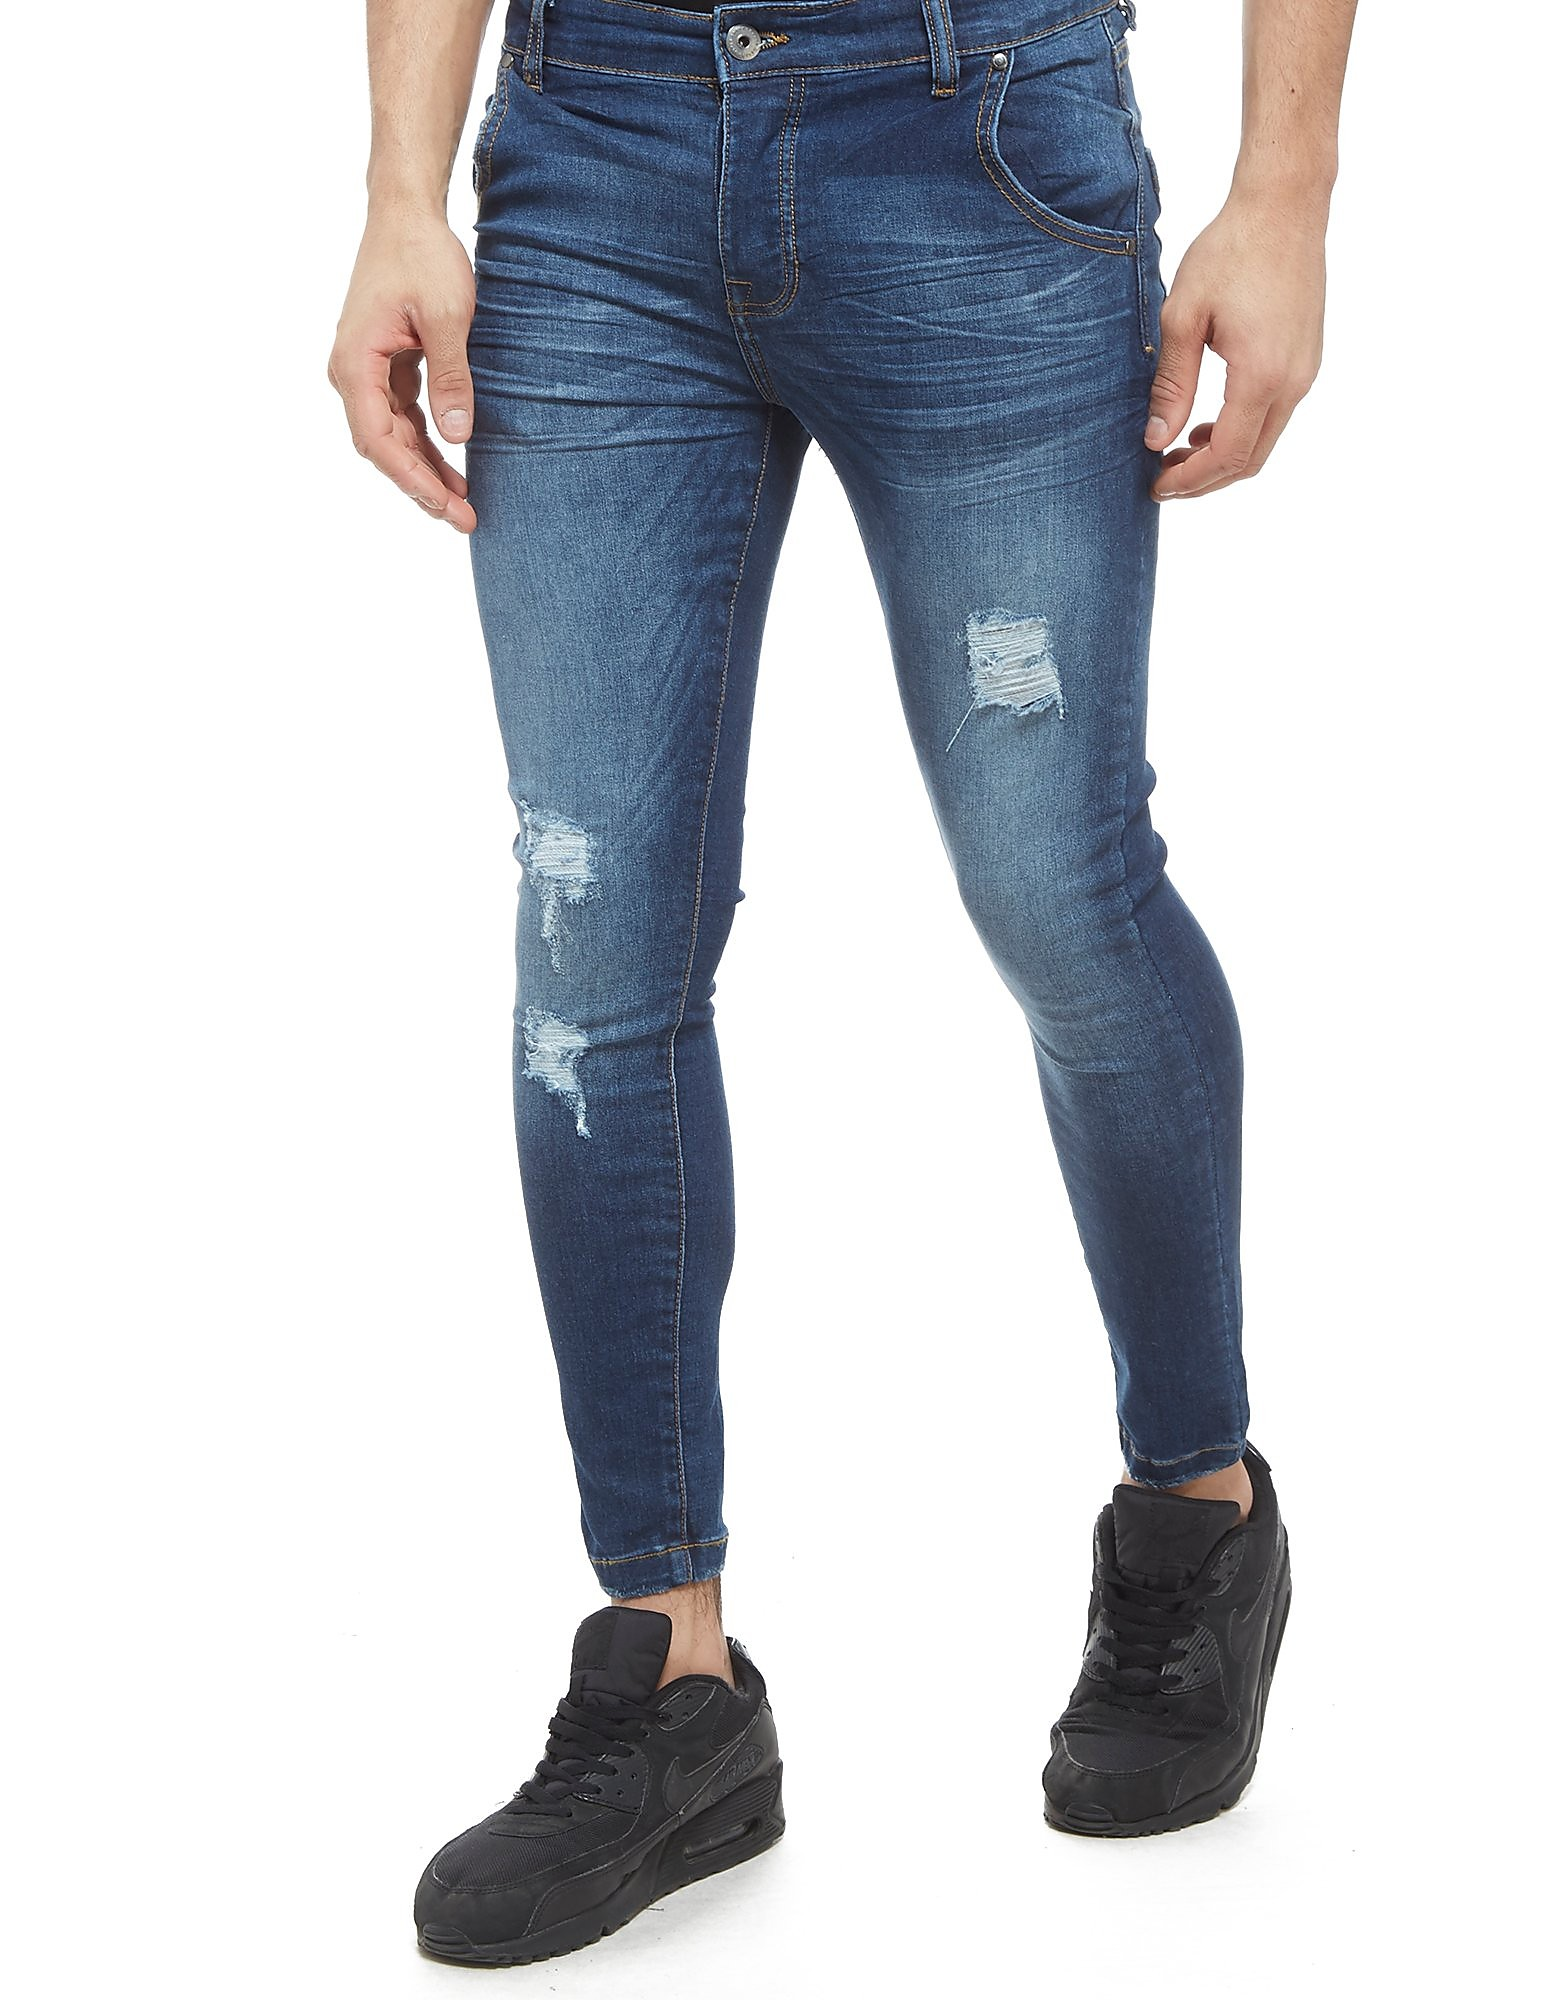 Nanny State Super Skinny Mid Wash Jeans